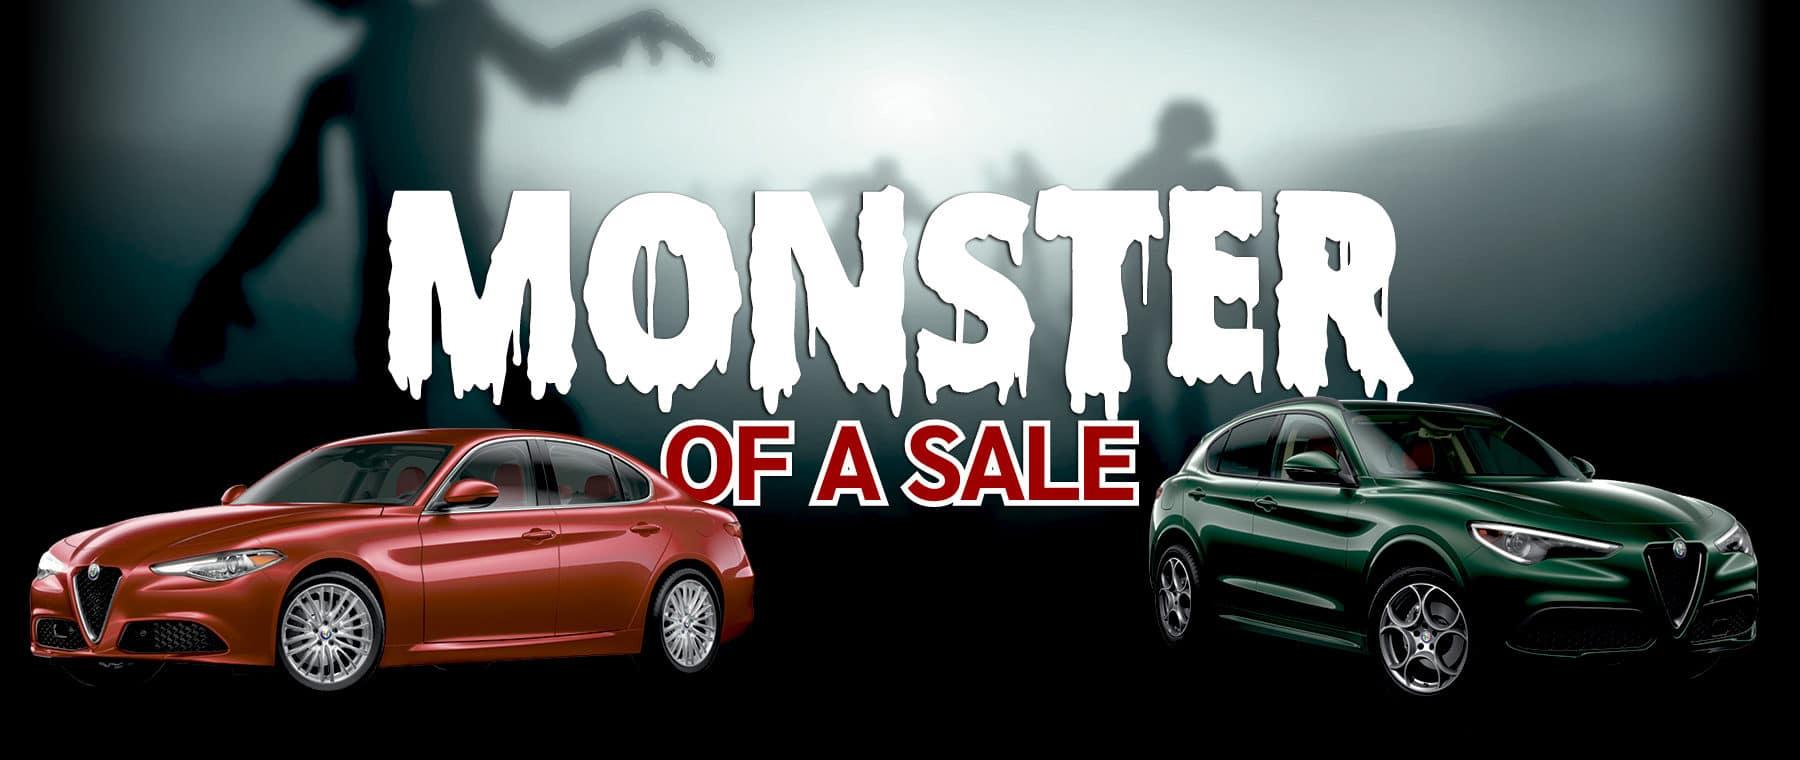 71054-ZARS_1800x760-MonsterSale-theme